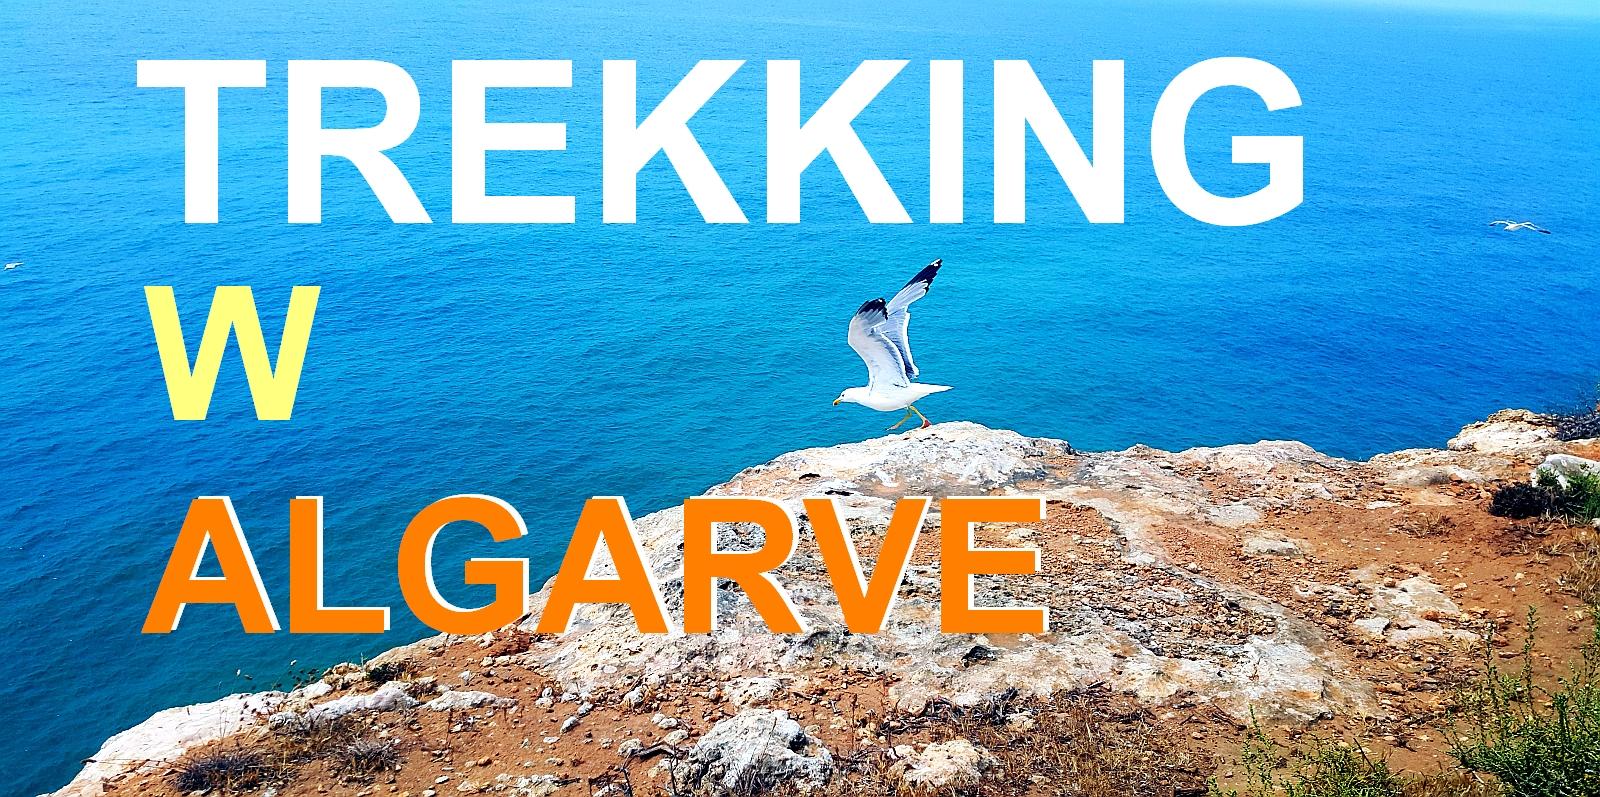 TREKKING W ALGARVE